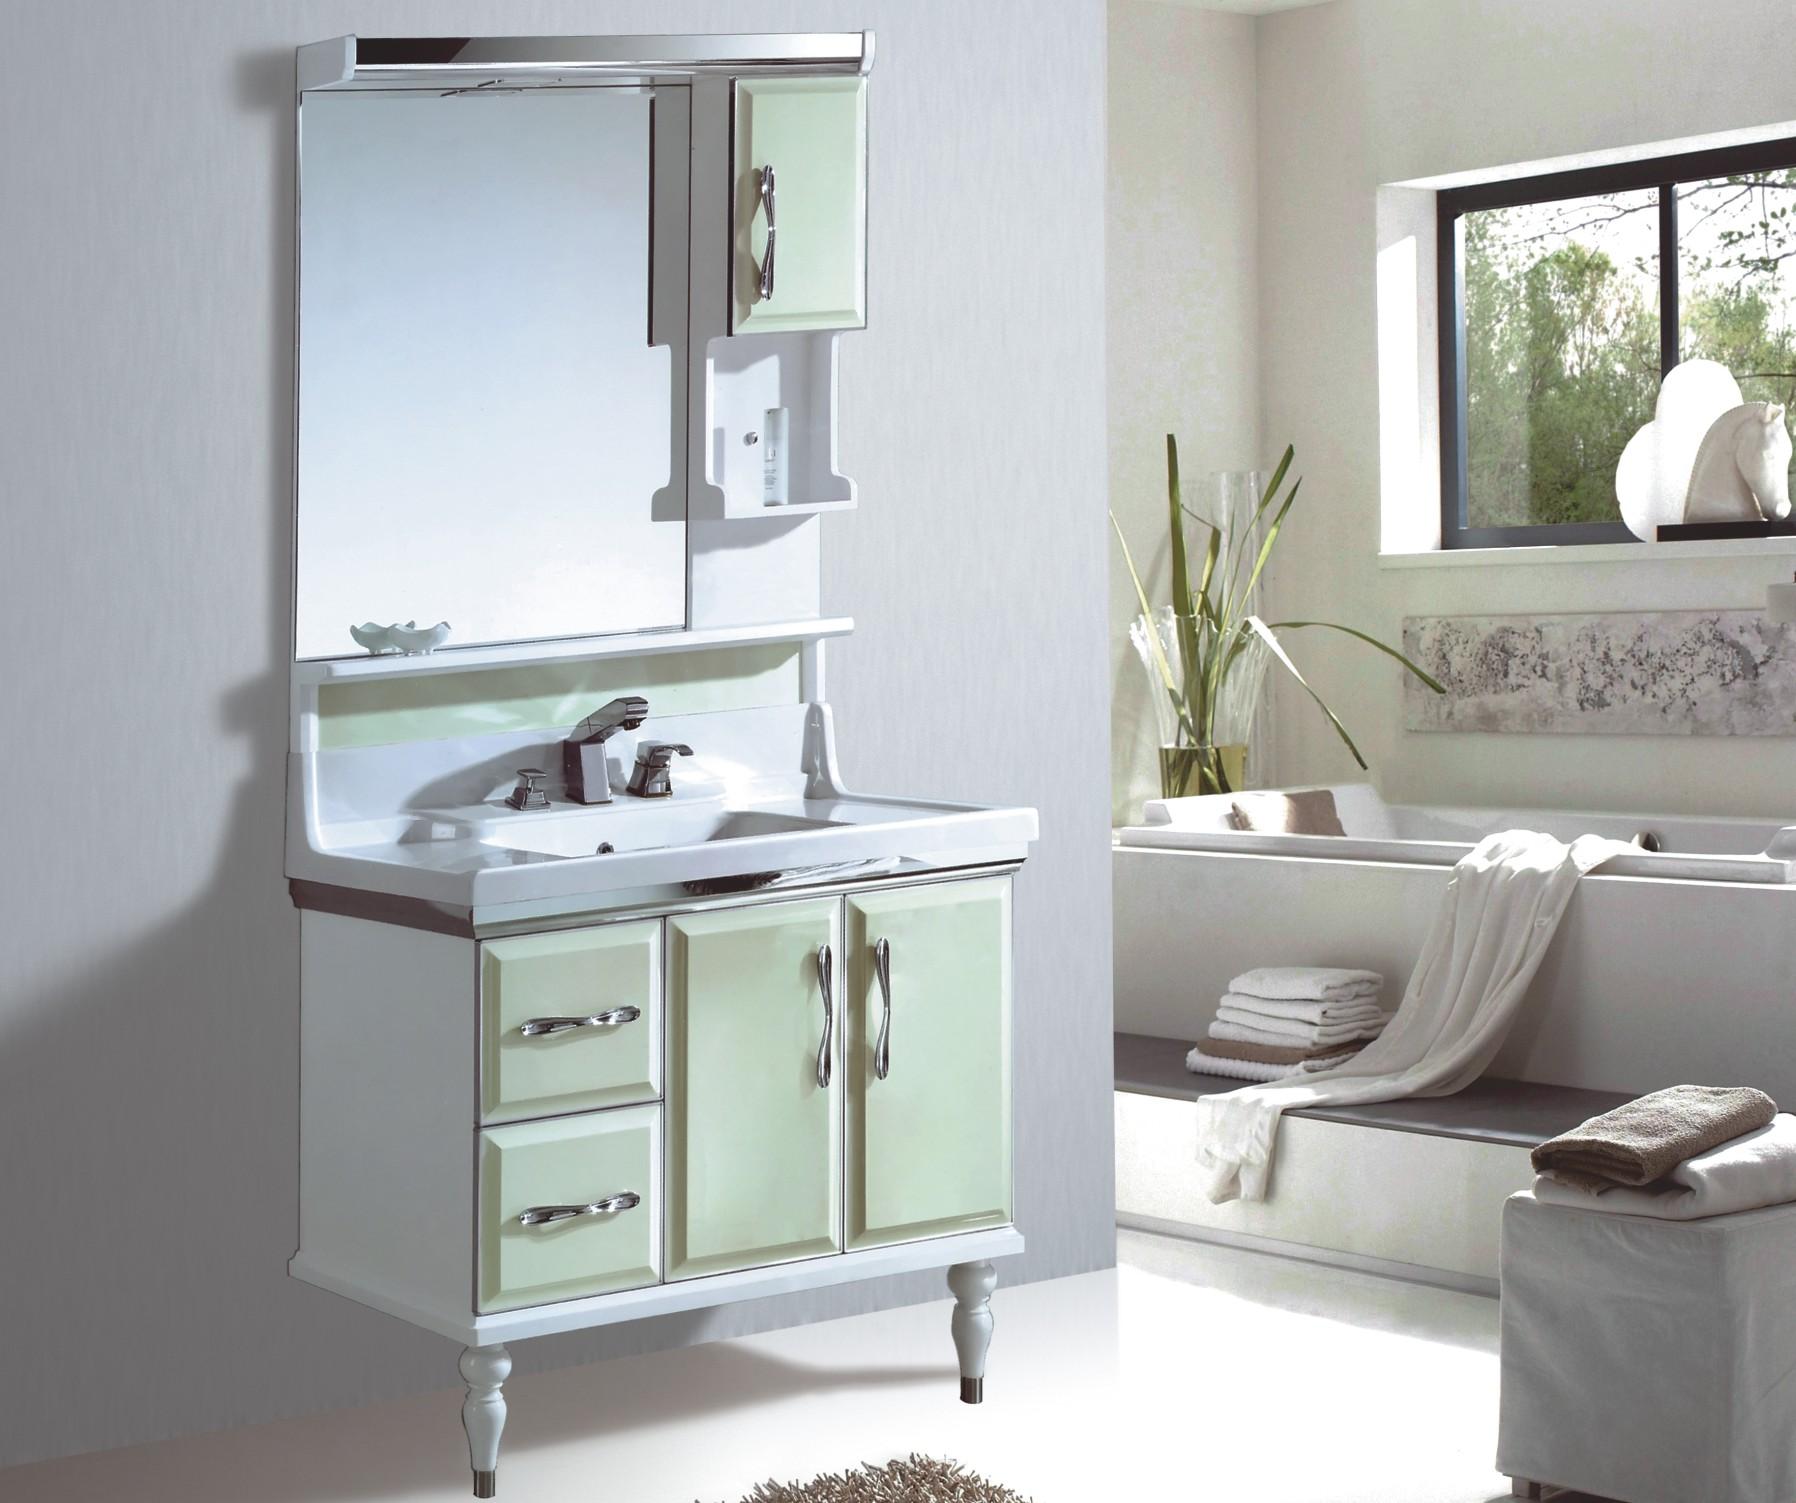 2018 Pvc Cheap Vanity Bathroom Sinks For Sale - Buy Cheap ...